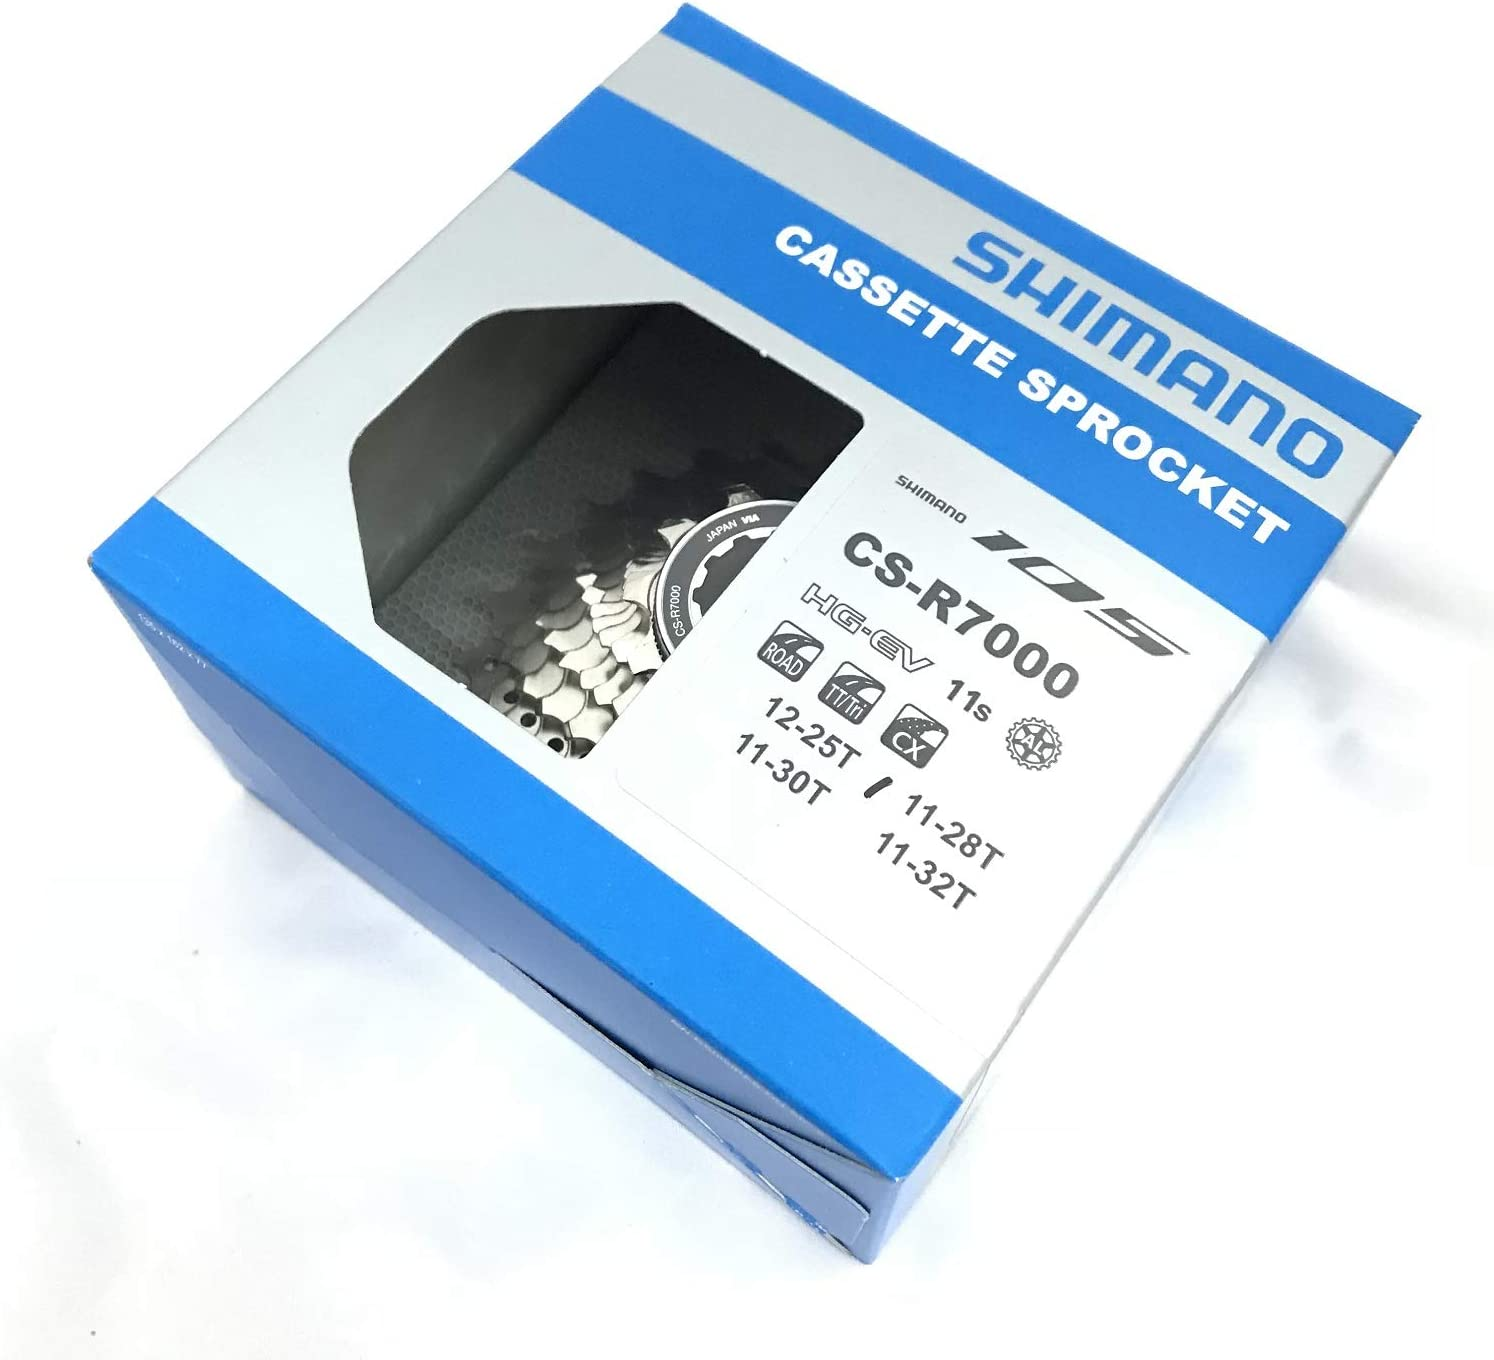 Shimano CS-R7000 11 Speed Road Cassette Sprocket 11-30T